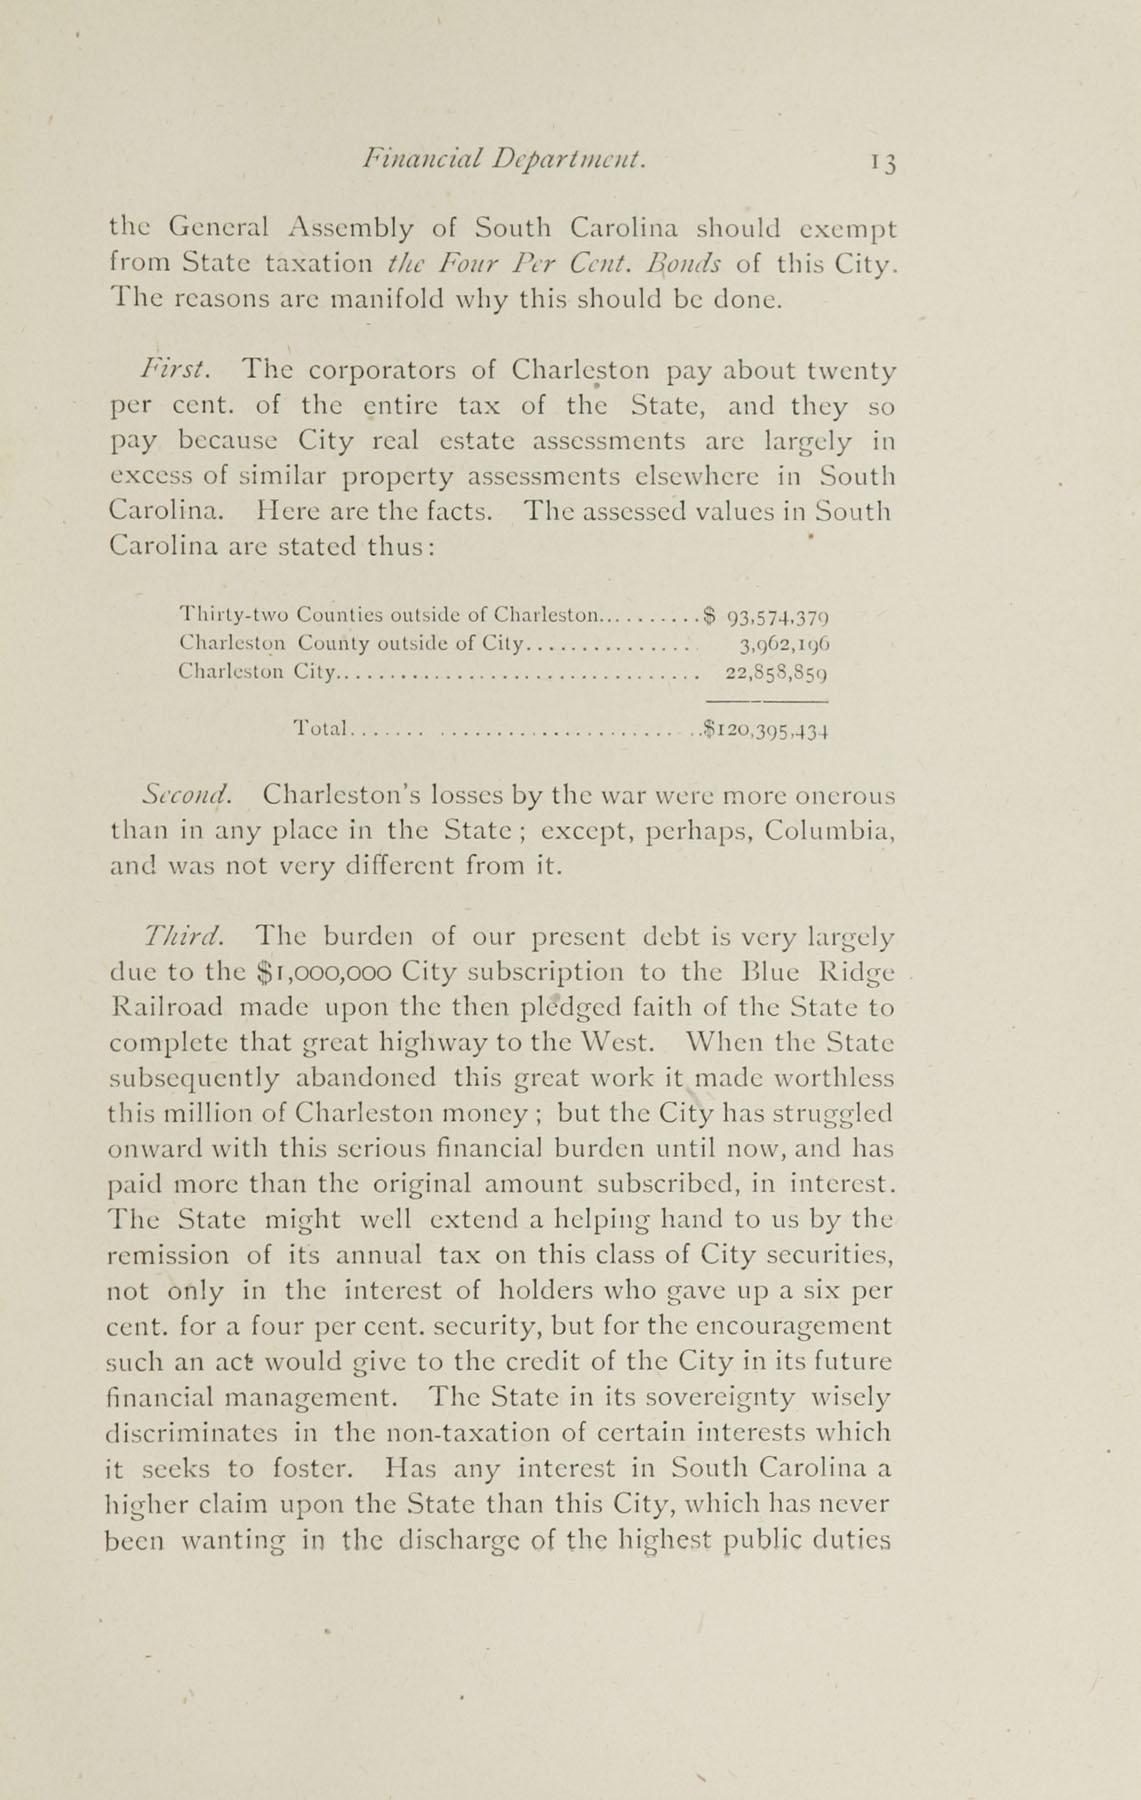 Charleston Year book, 1880, page 13